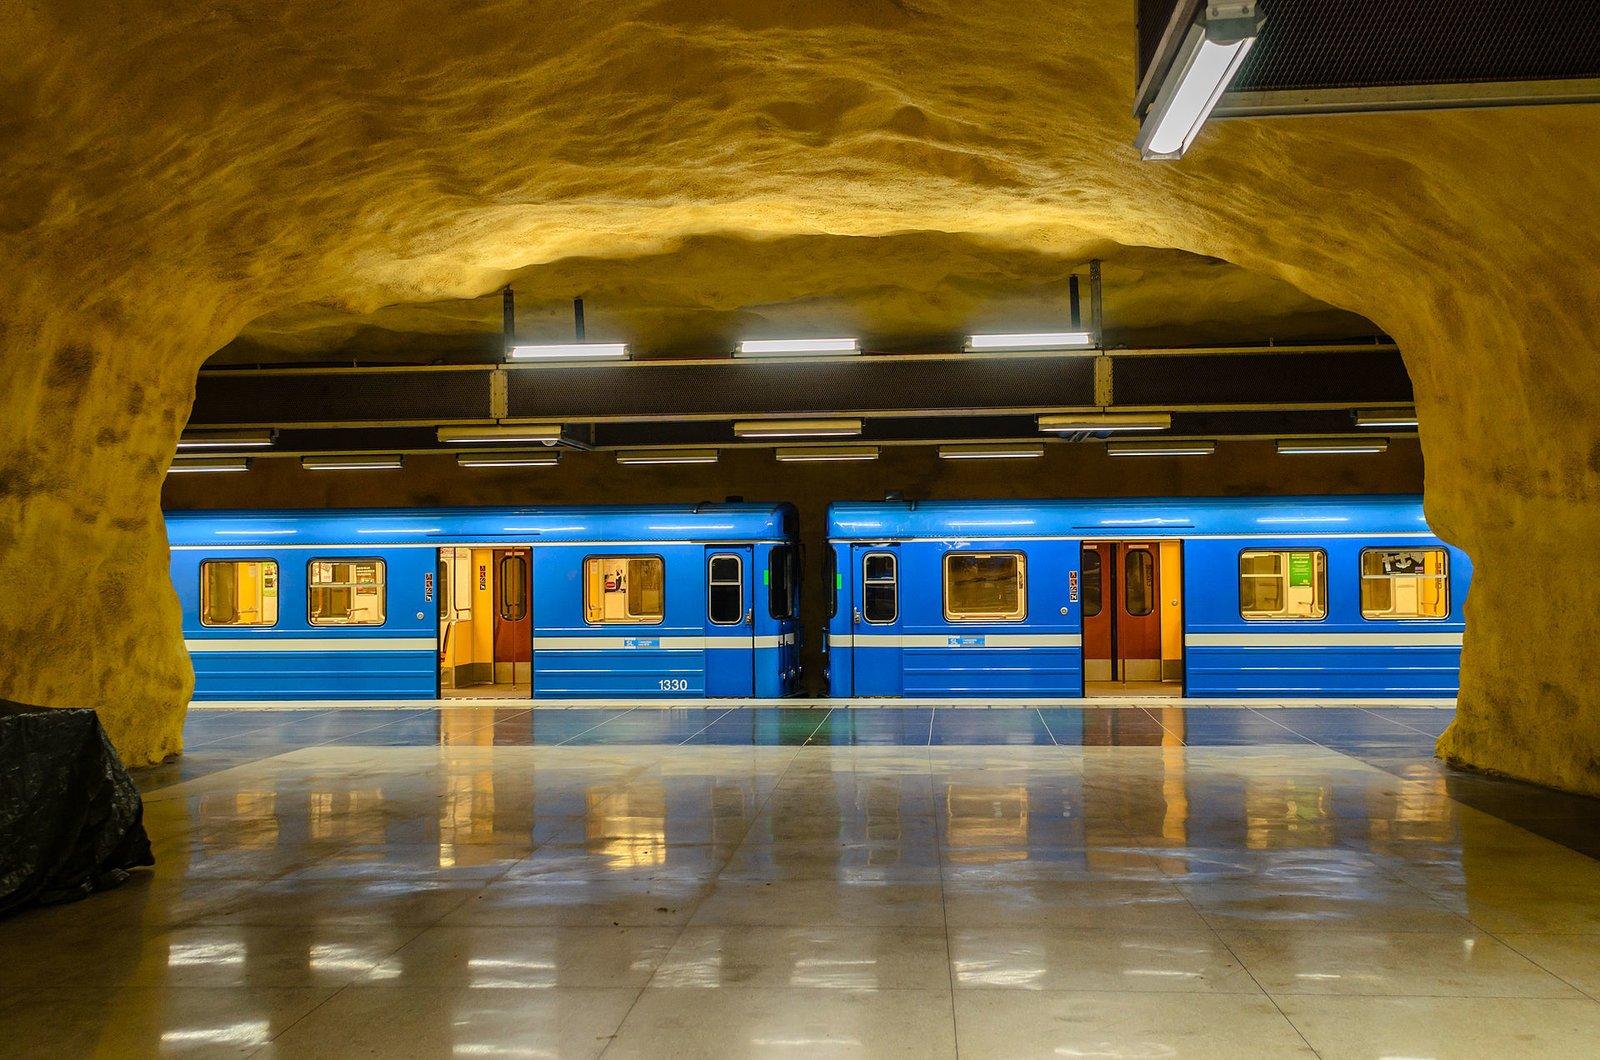 Photo 6 of 10 in Explore the Stockholm Metro For a Tour Through 5 Decades of European Art History